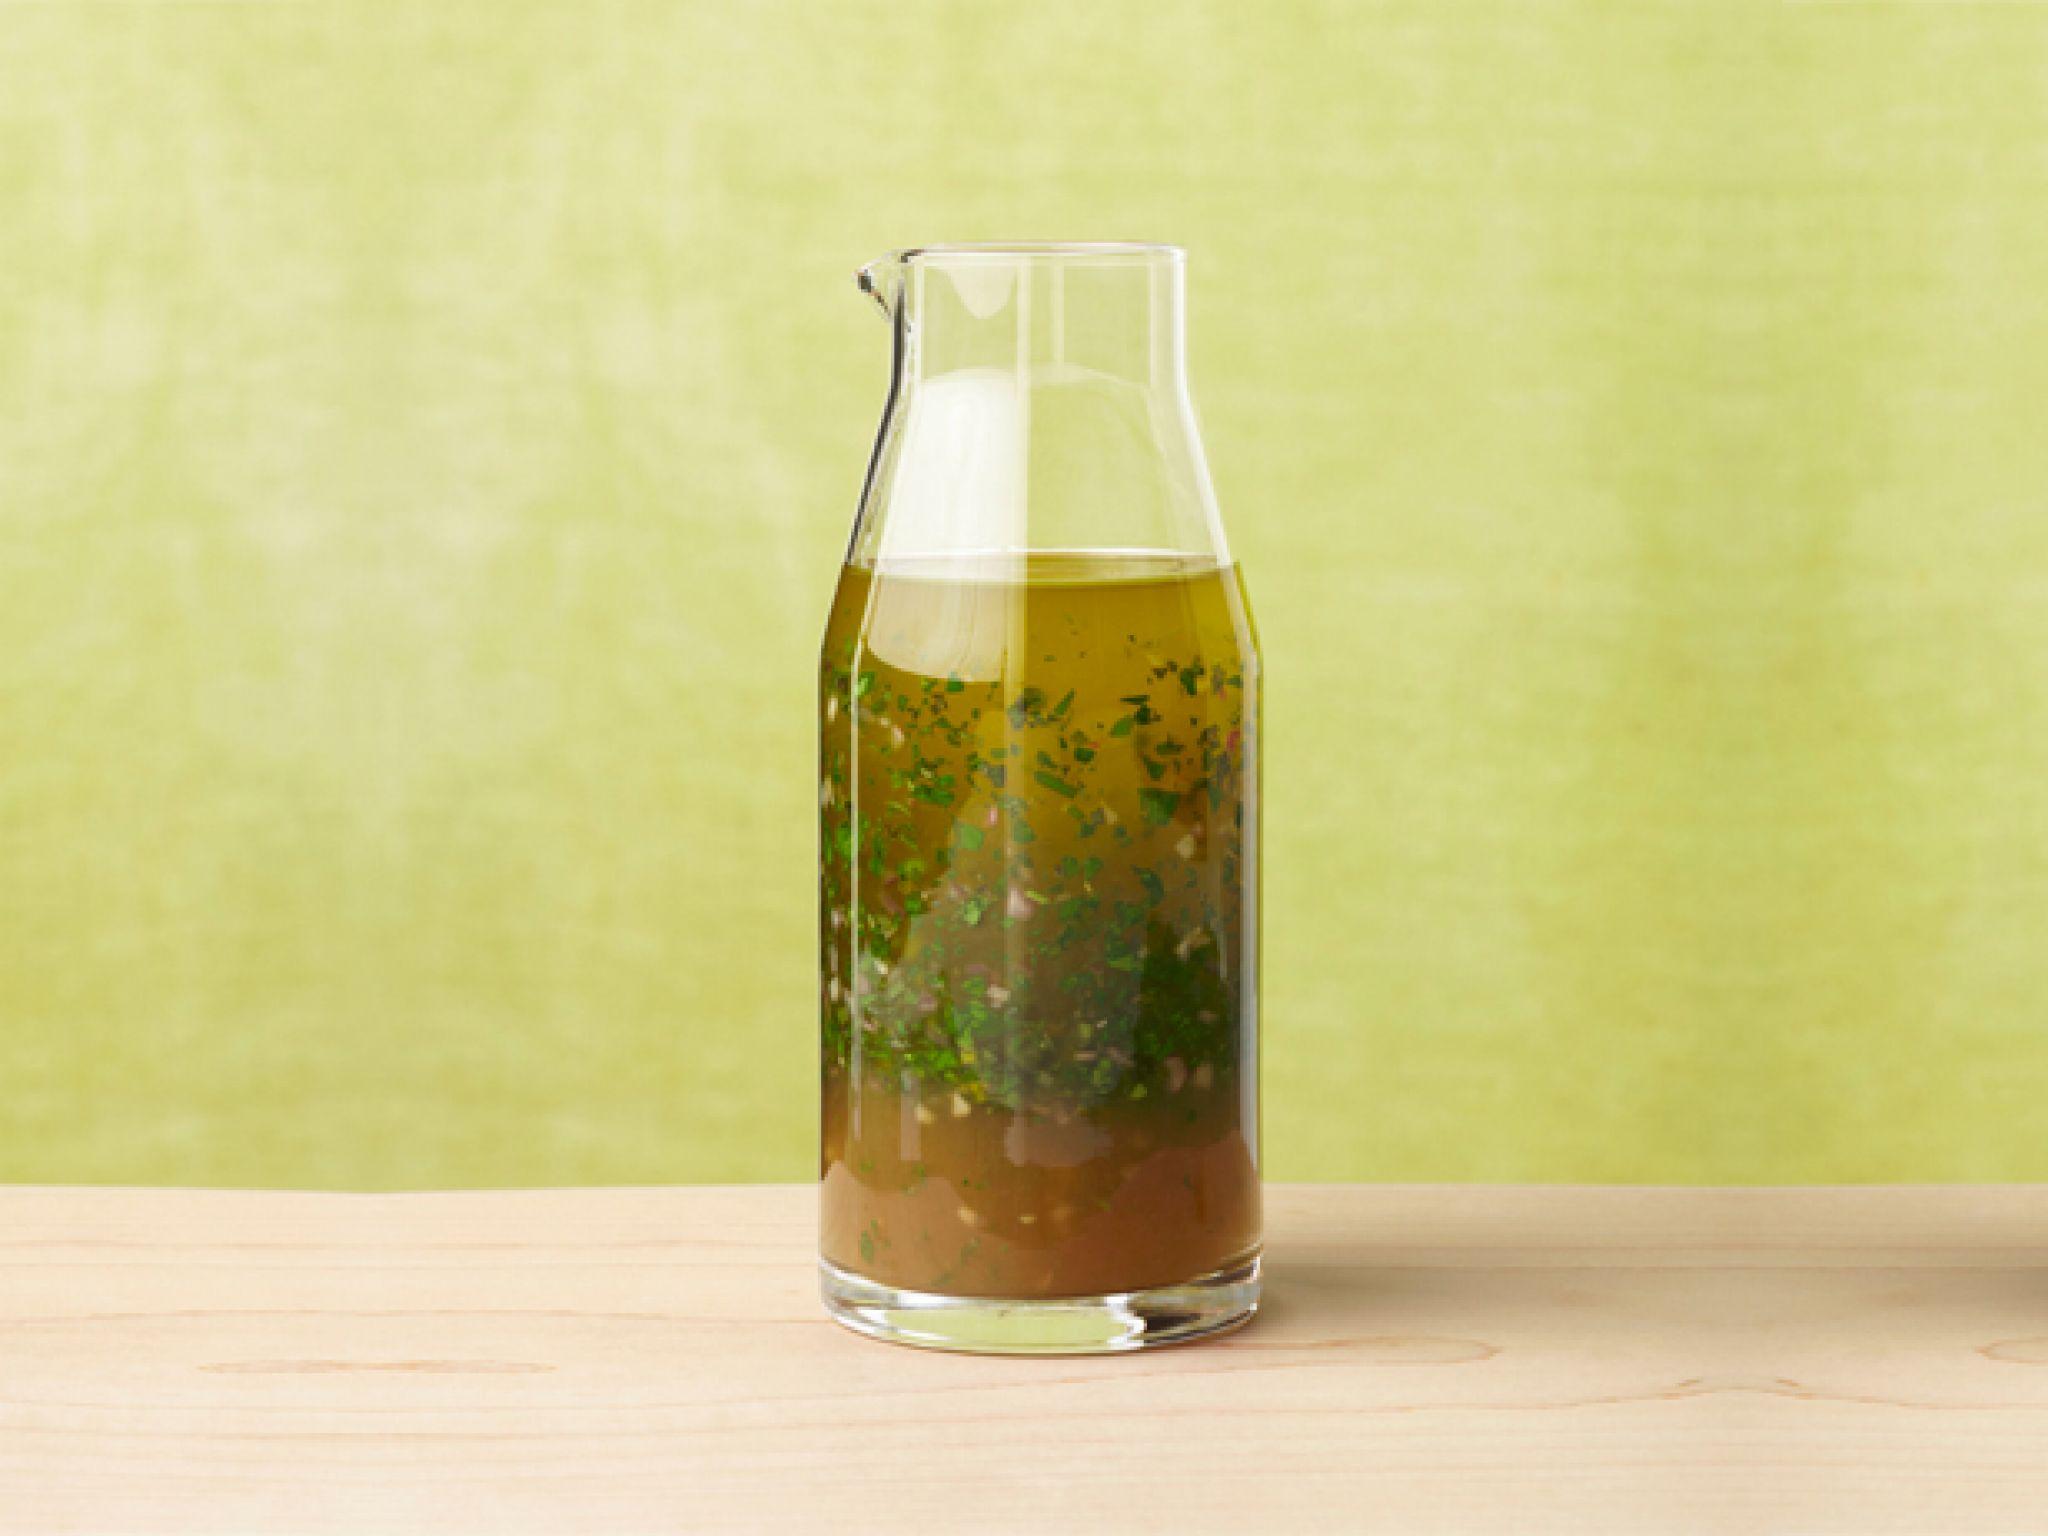 fnm_040113-classic-vinaigrette-salad-dressing-recipe_s4x3-jpg-rend-sniipadlarge